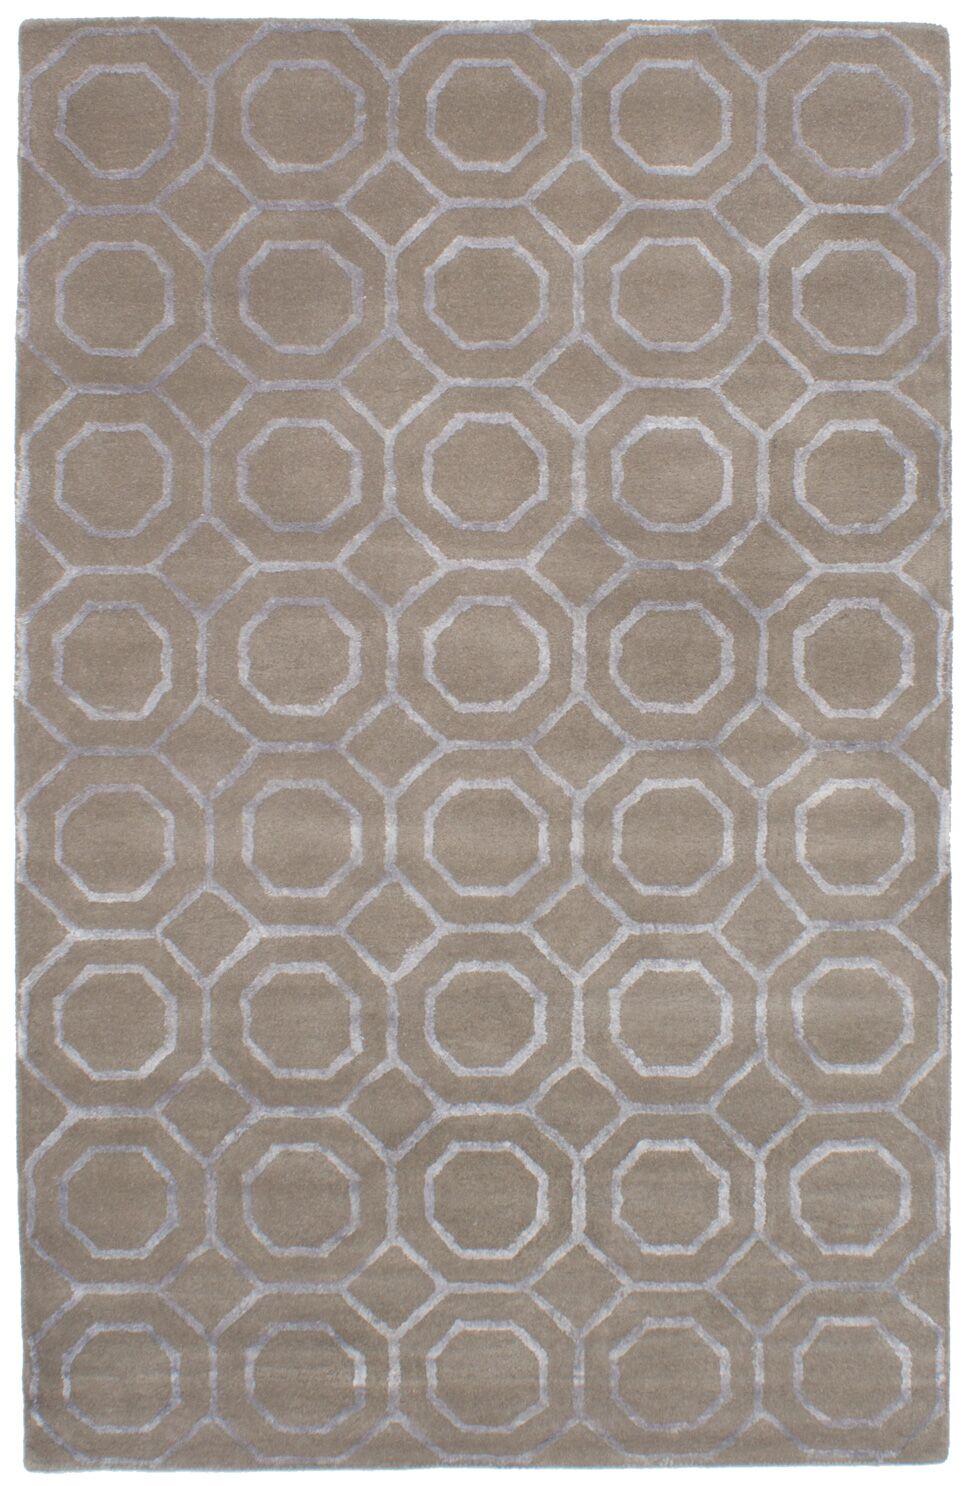 Griffing Hand-Tufted Wool/Silk Dark Khaki Area Rug